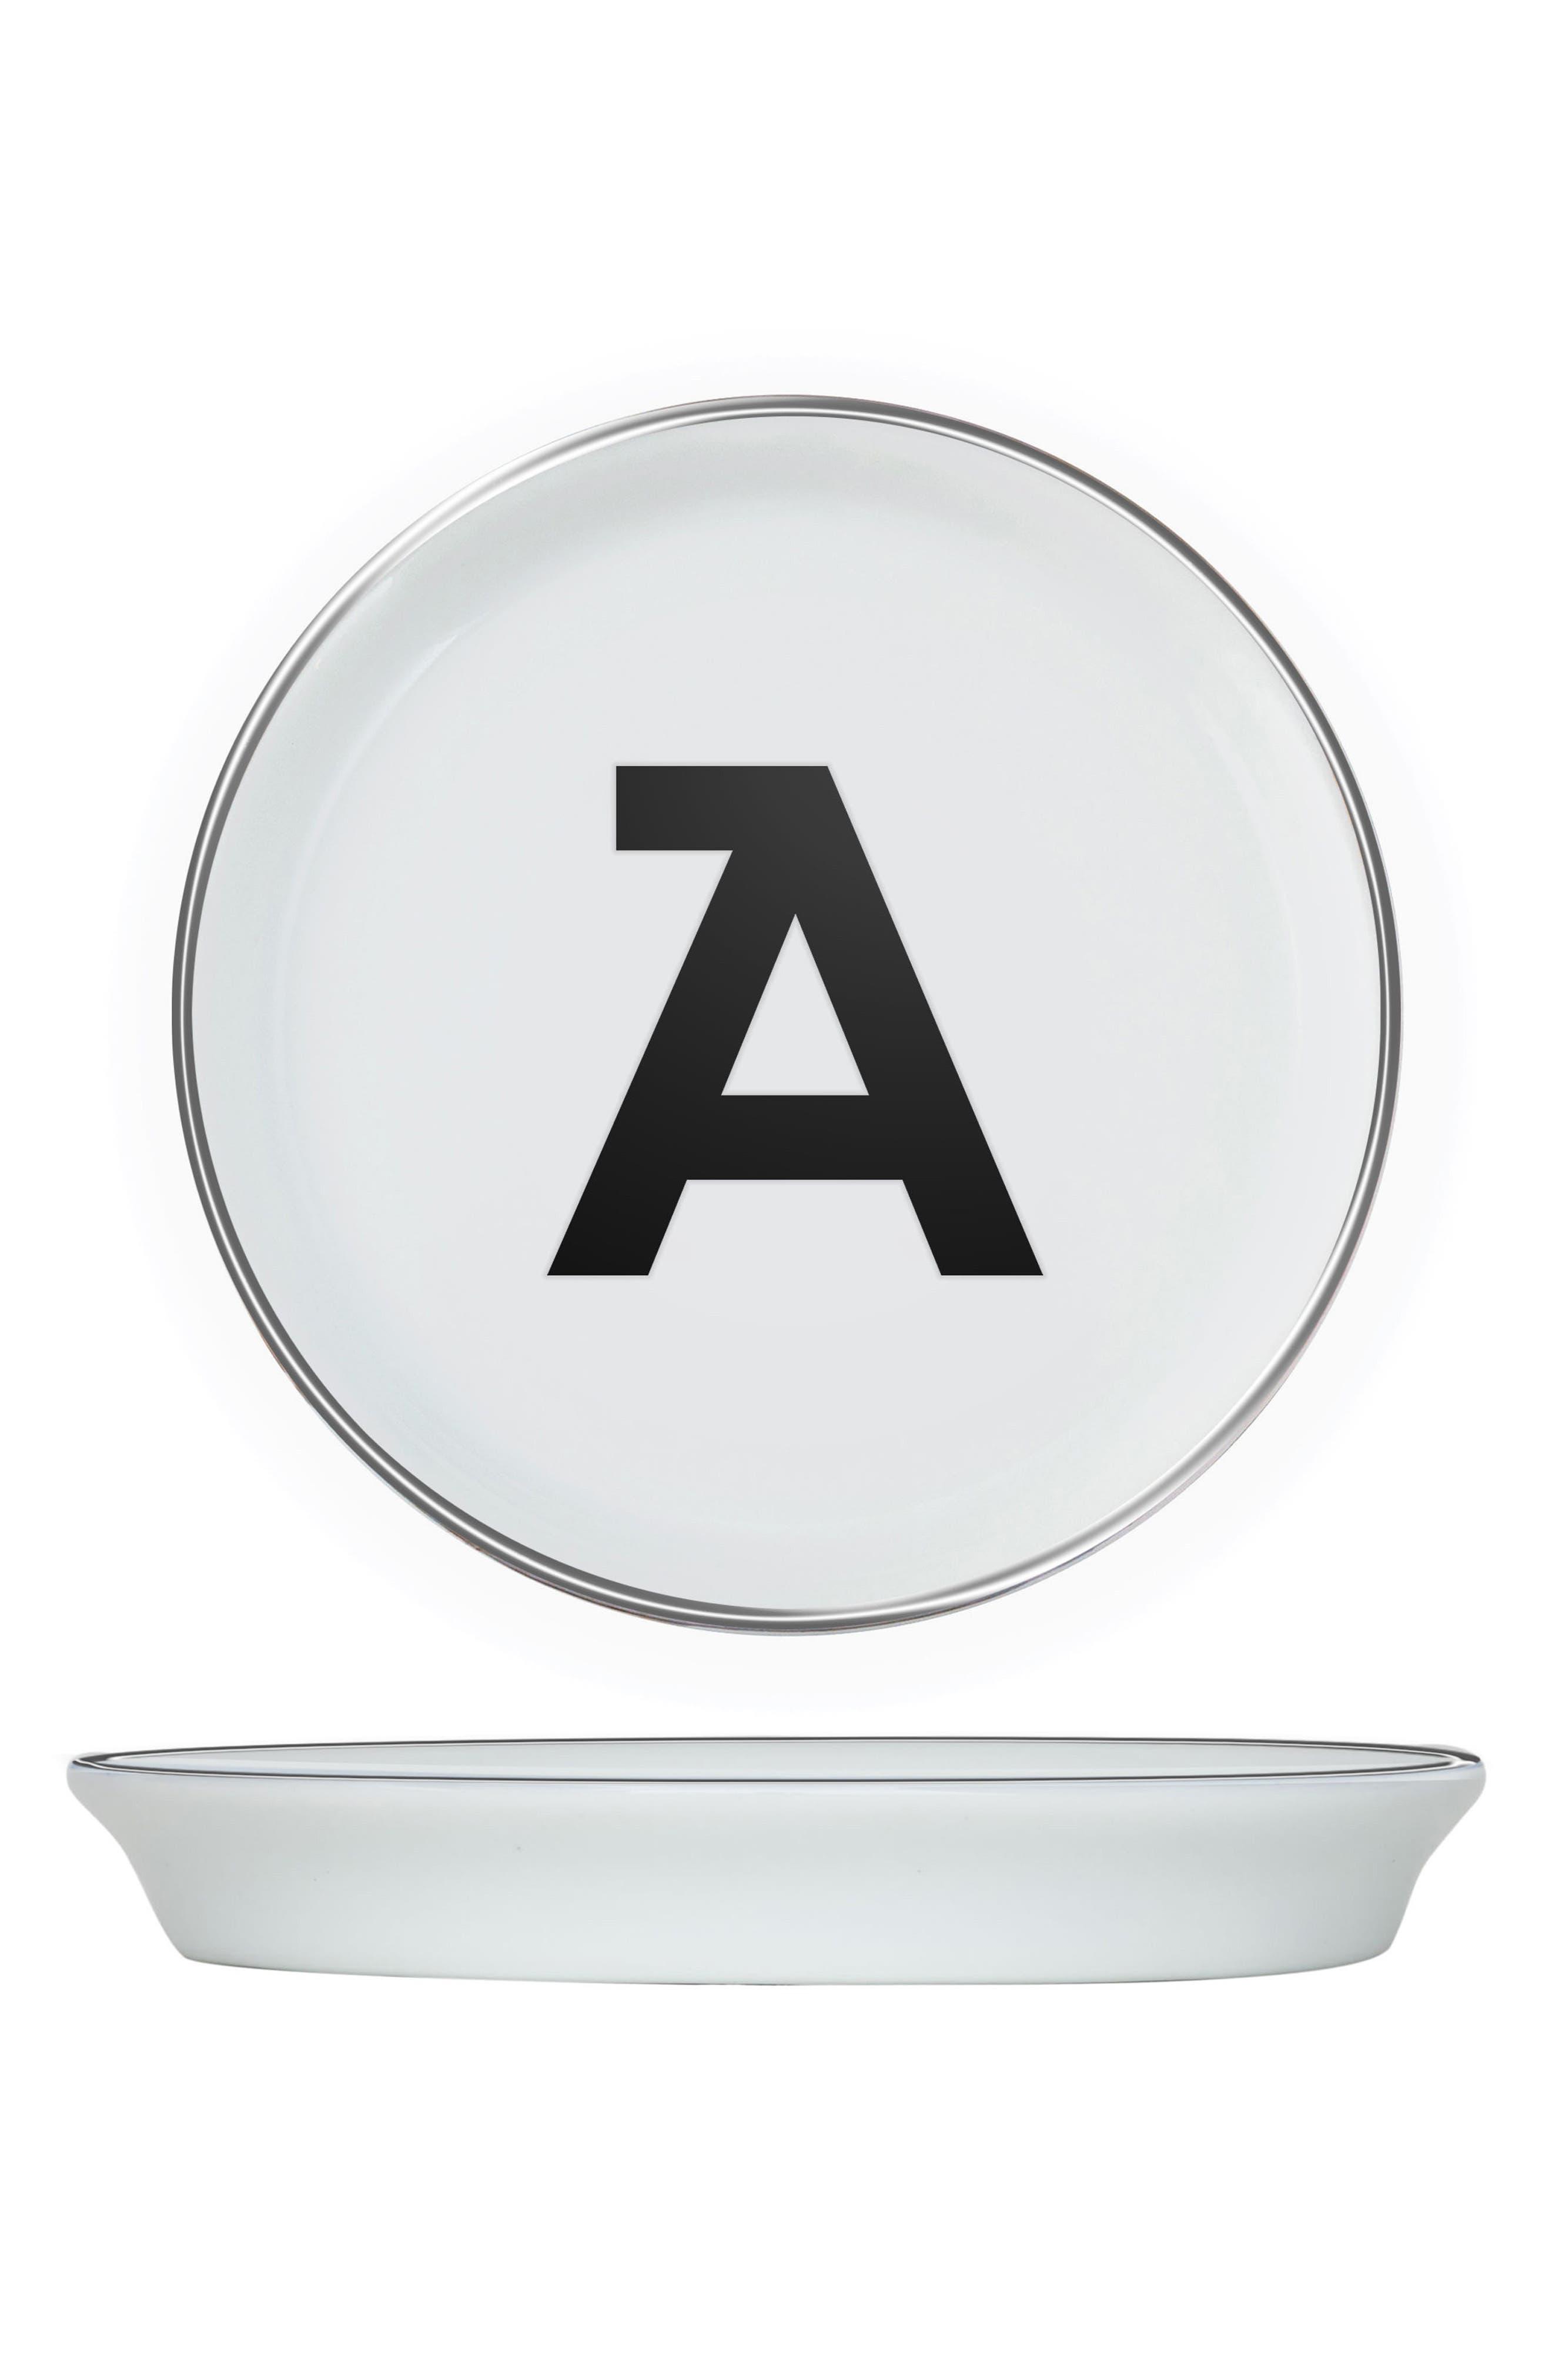 Brooklyn Set of 4 Porcelain Initial Coasters,                             Main thumbnail 1, color,                             A